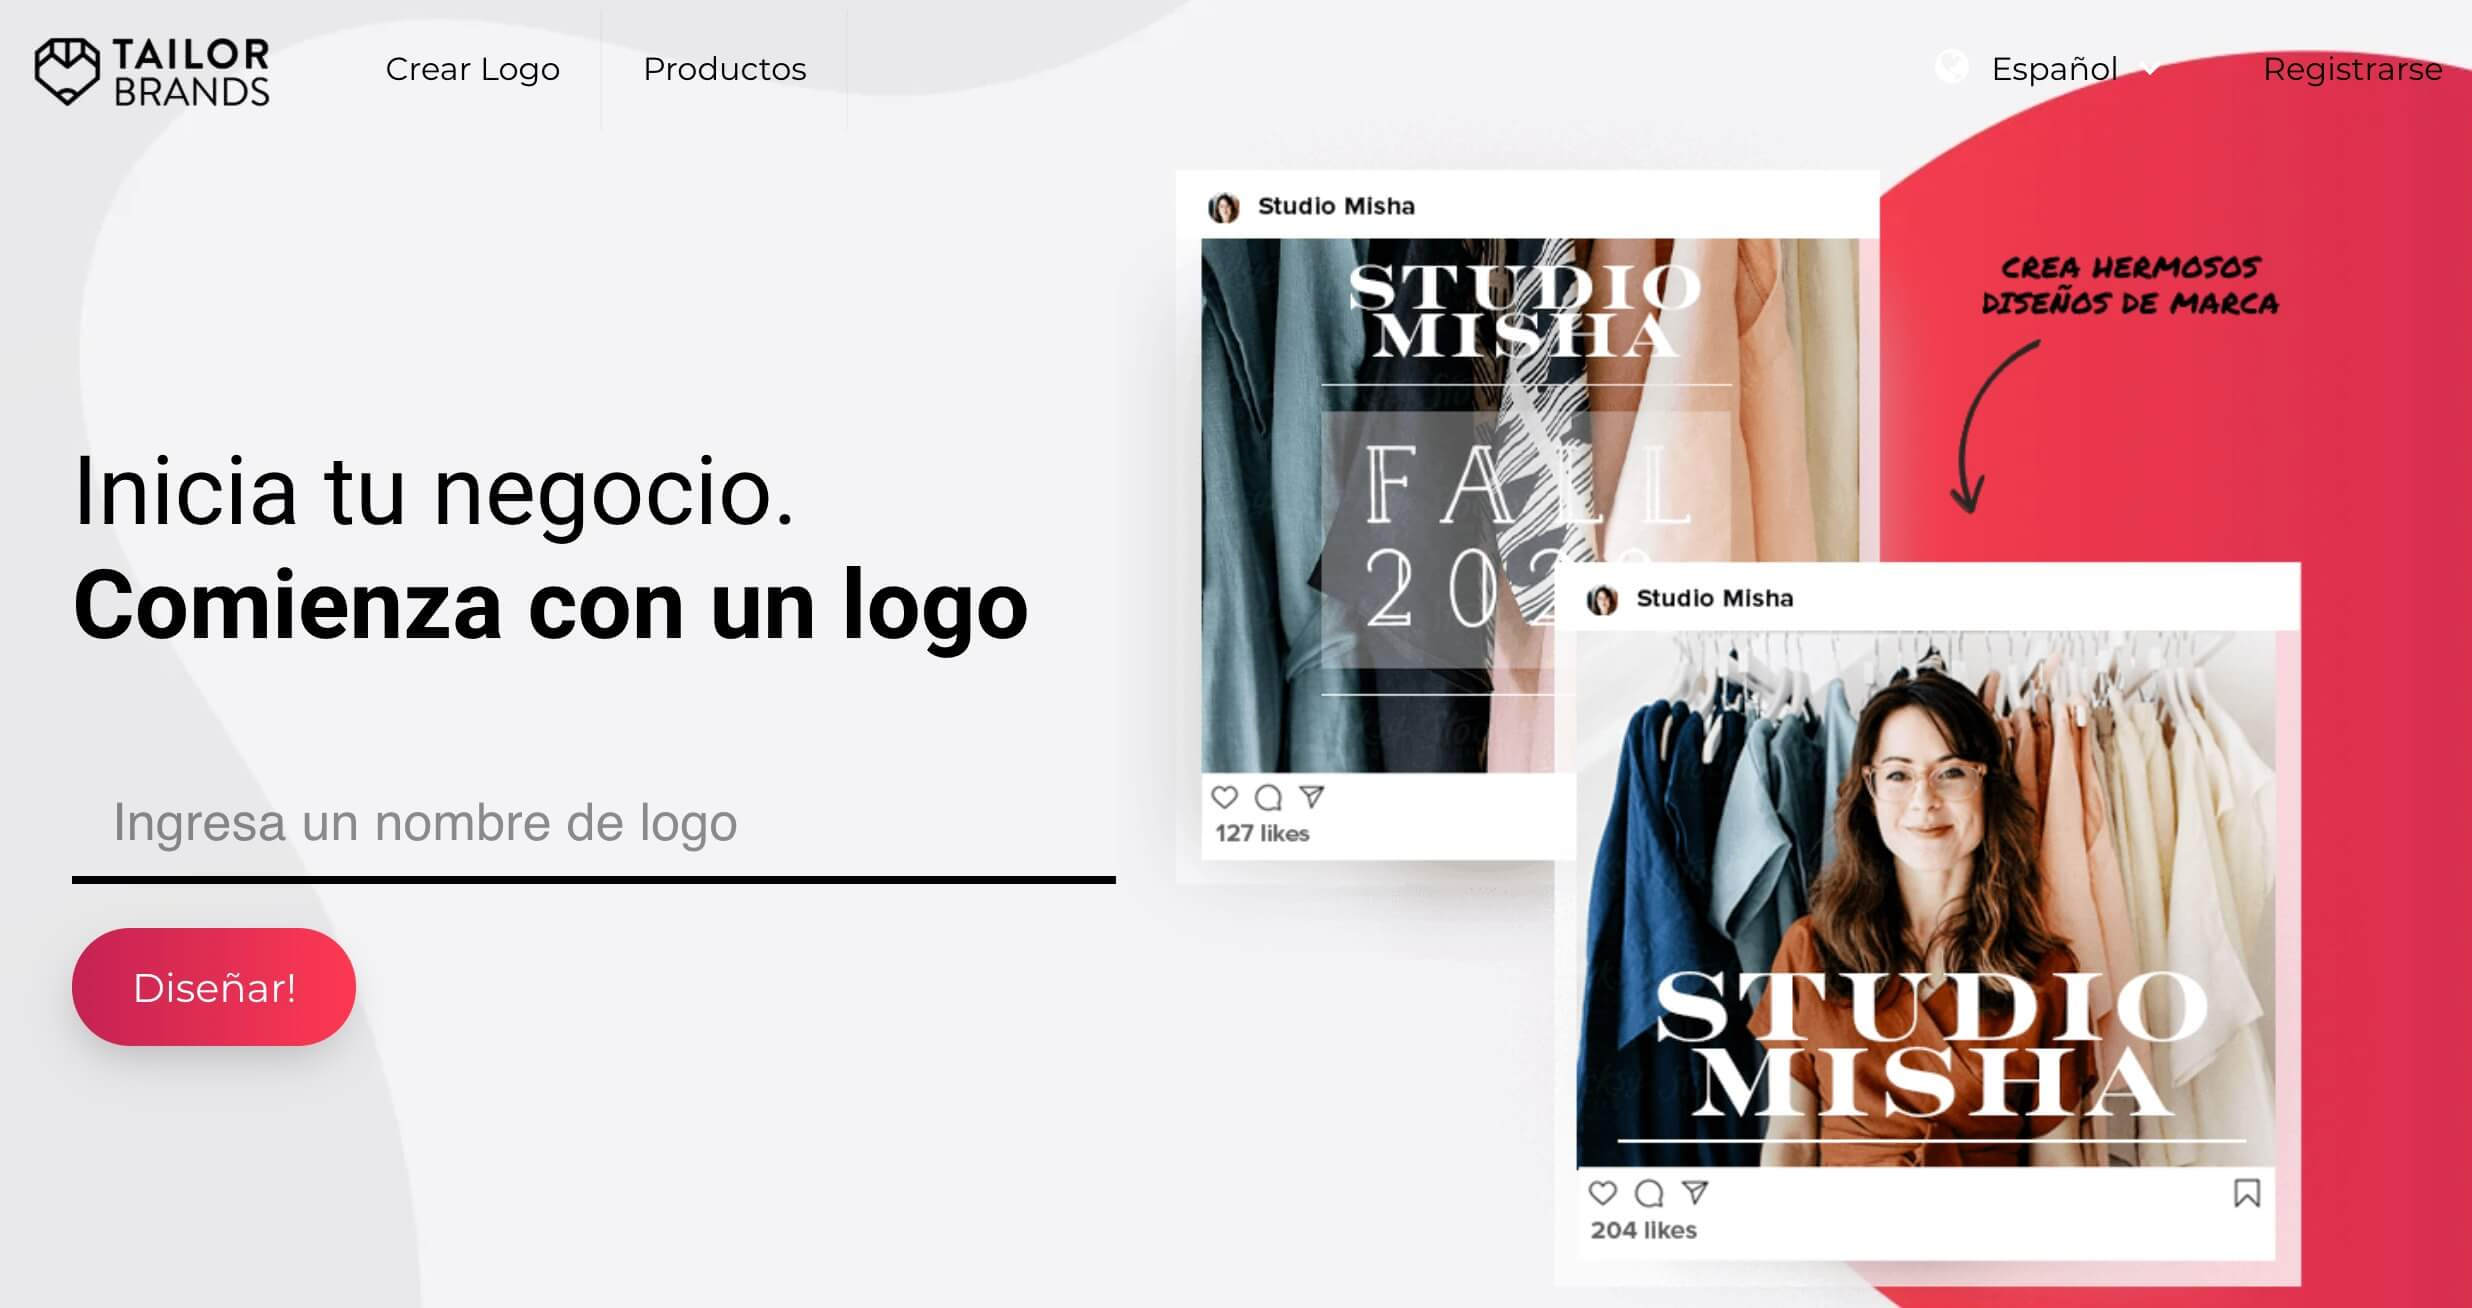 Creador de logos Tailorbrands